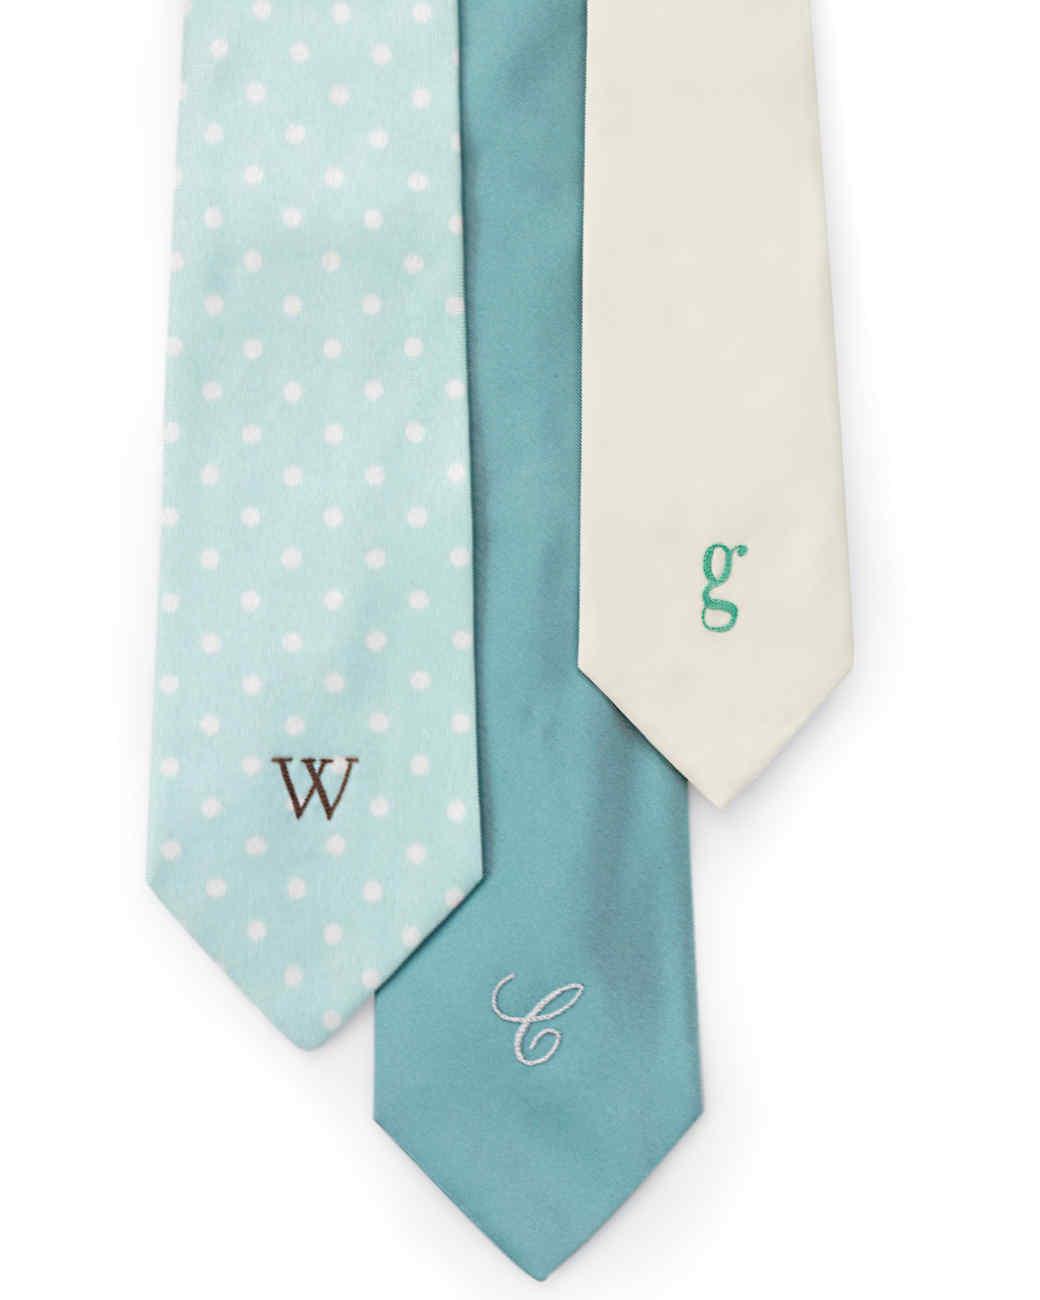 Personalized Necktie